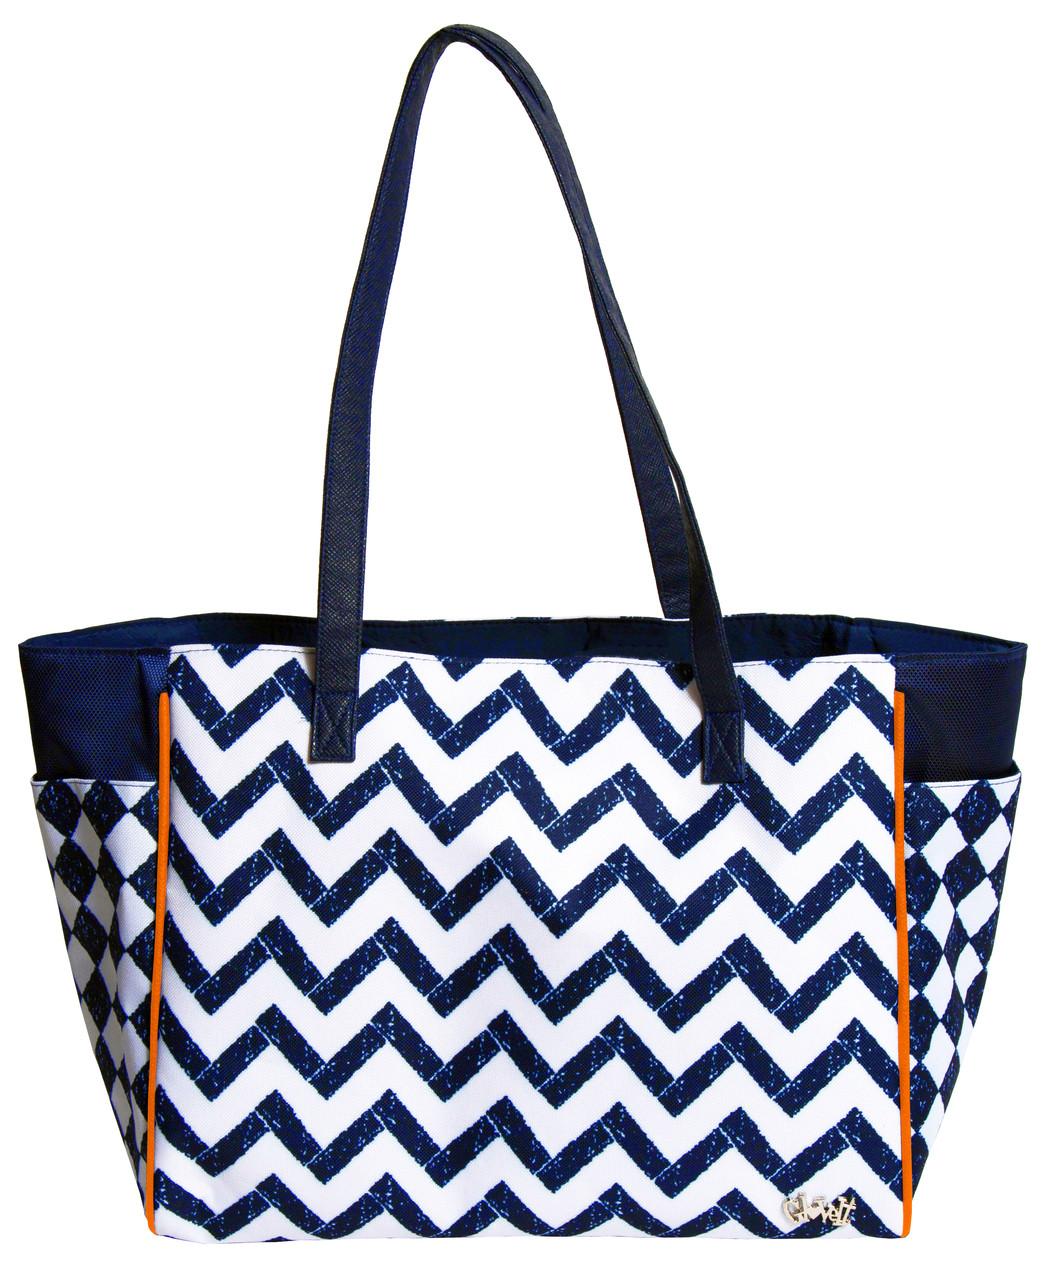 64183d5ef1a2 Glove It Ladies Coastal Tile Tote Bag